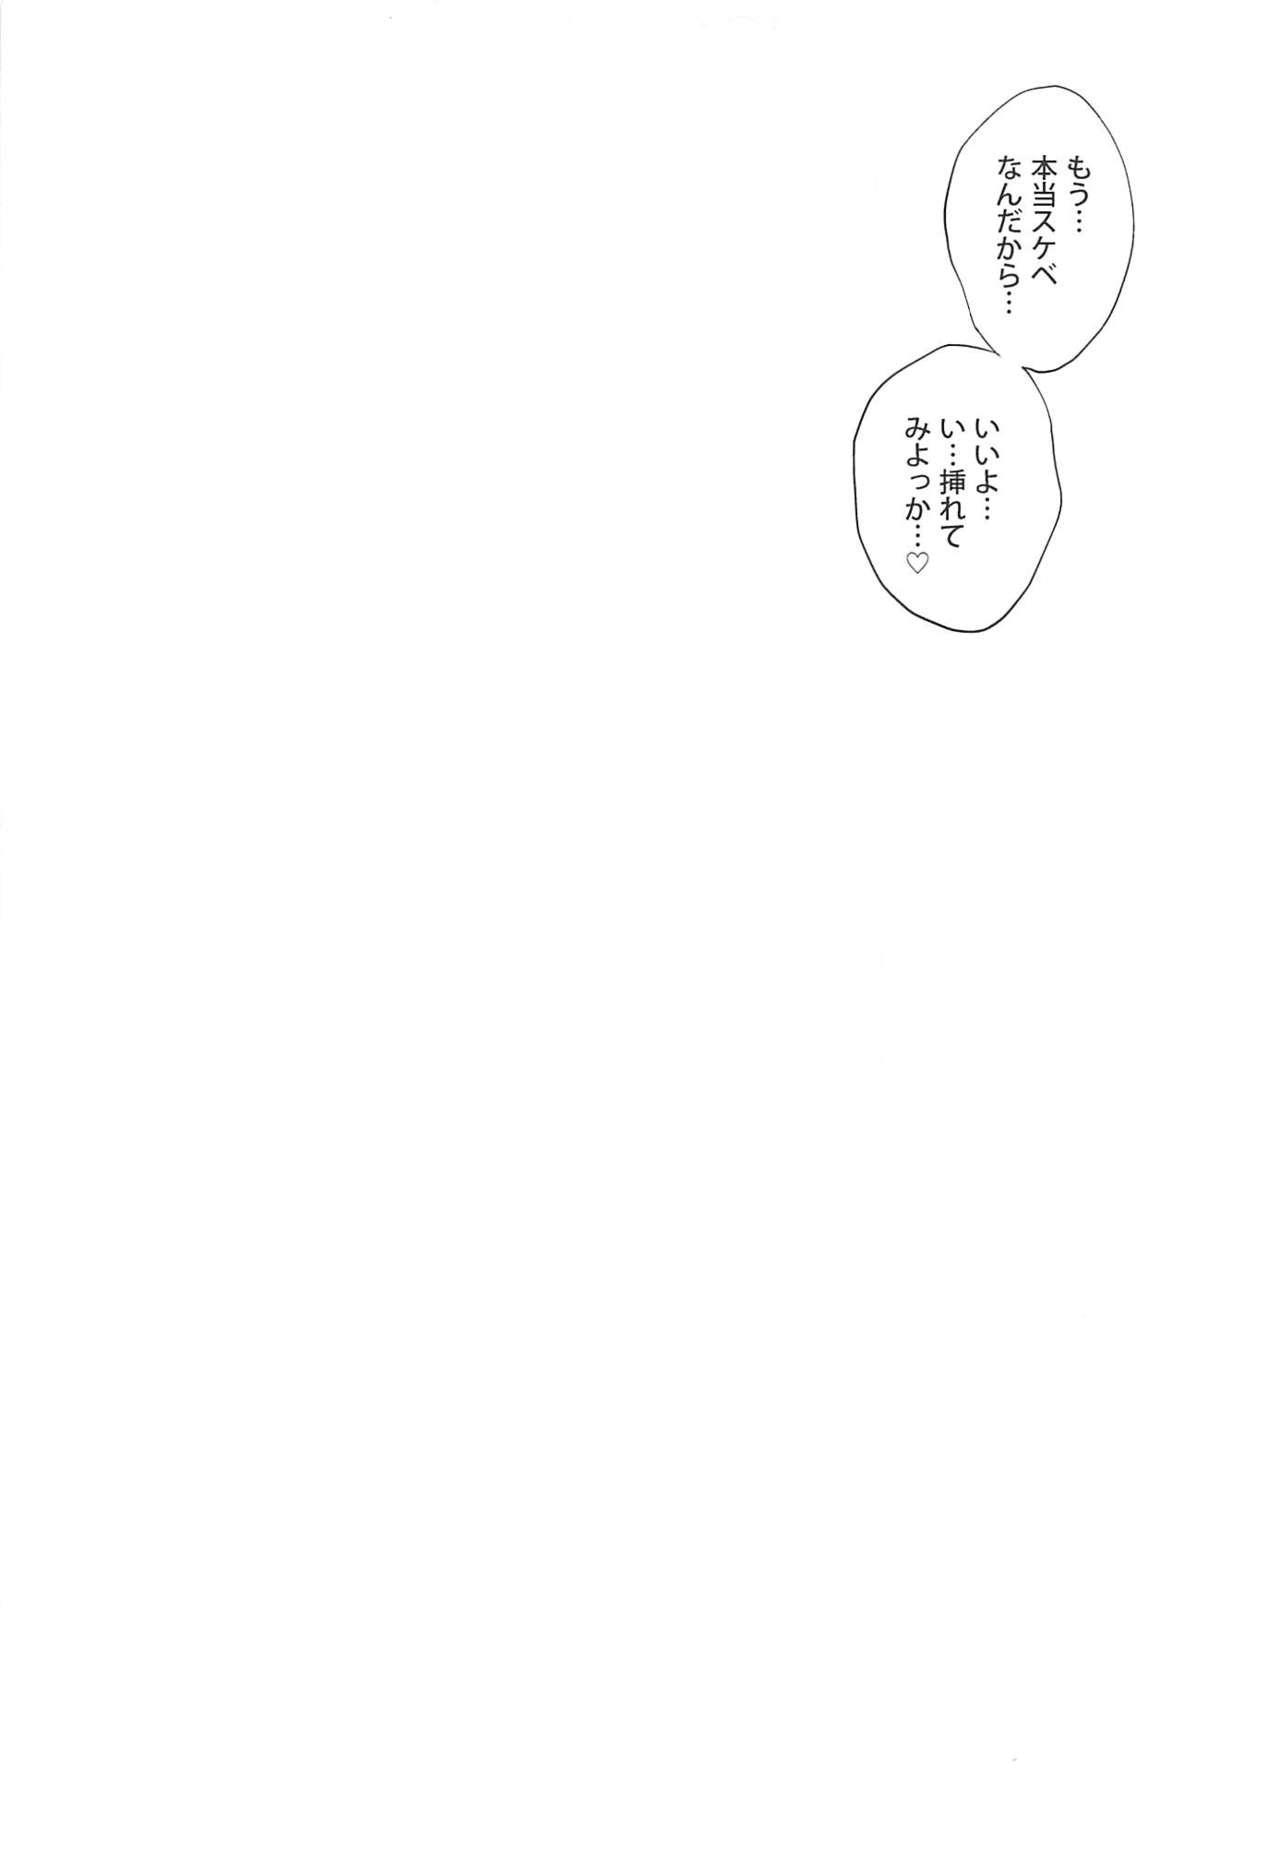 [Mata Ashita. (Oohira Sunset)] Boudica-san to Gom. -Anal Hen- (Fate/Grand Order) [2019-09-22] 23